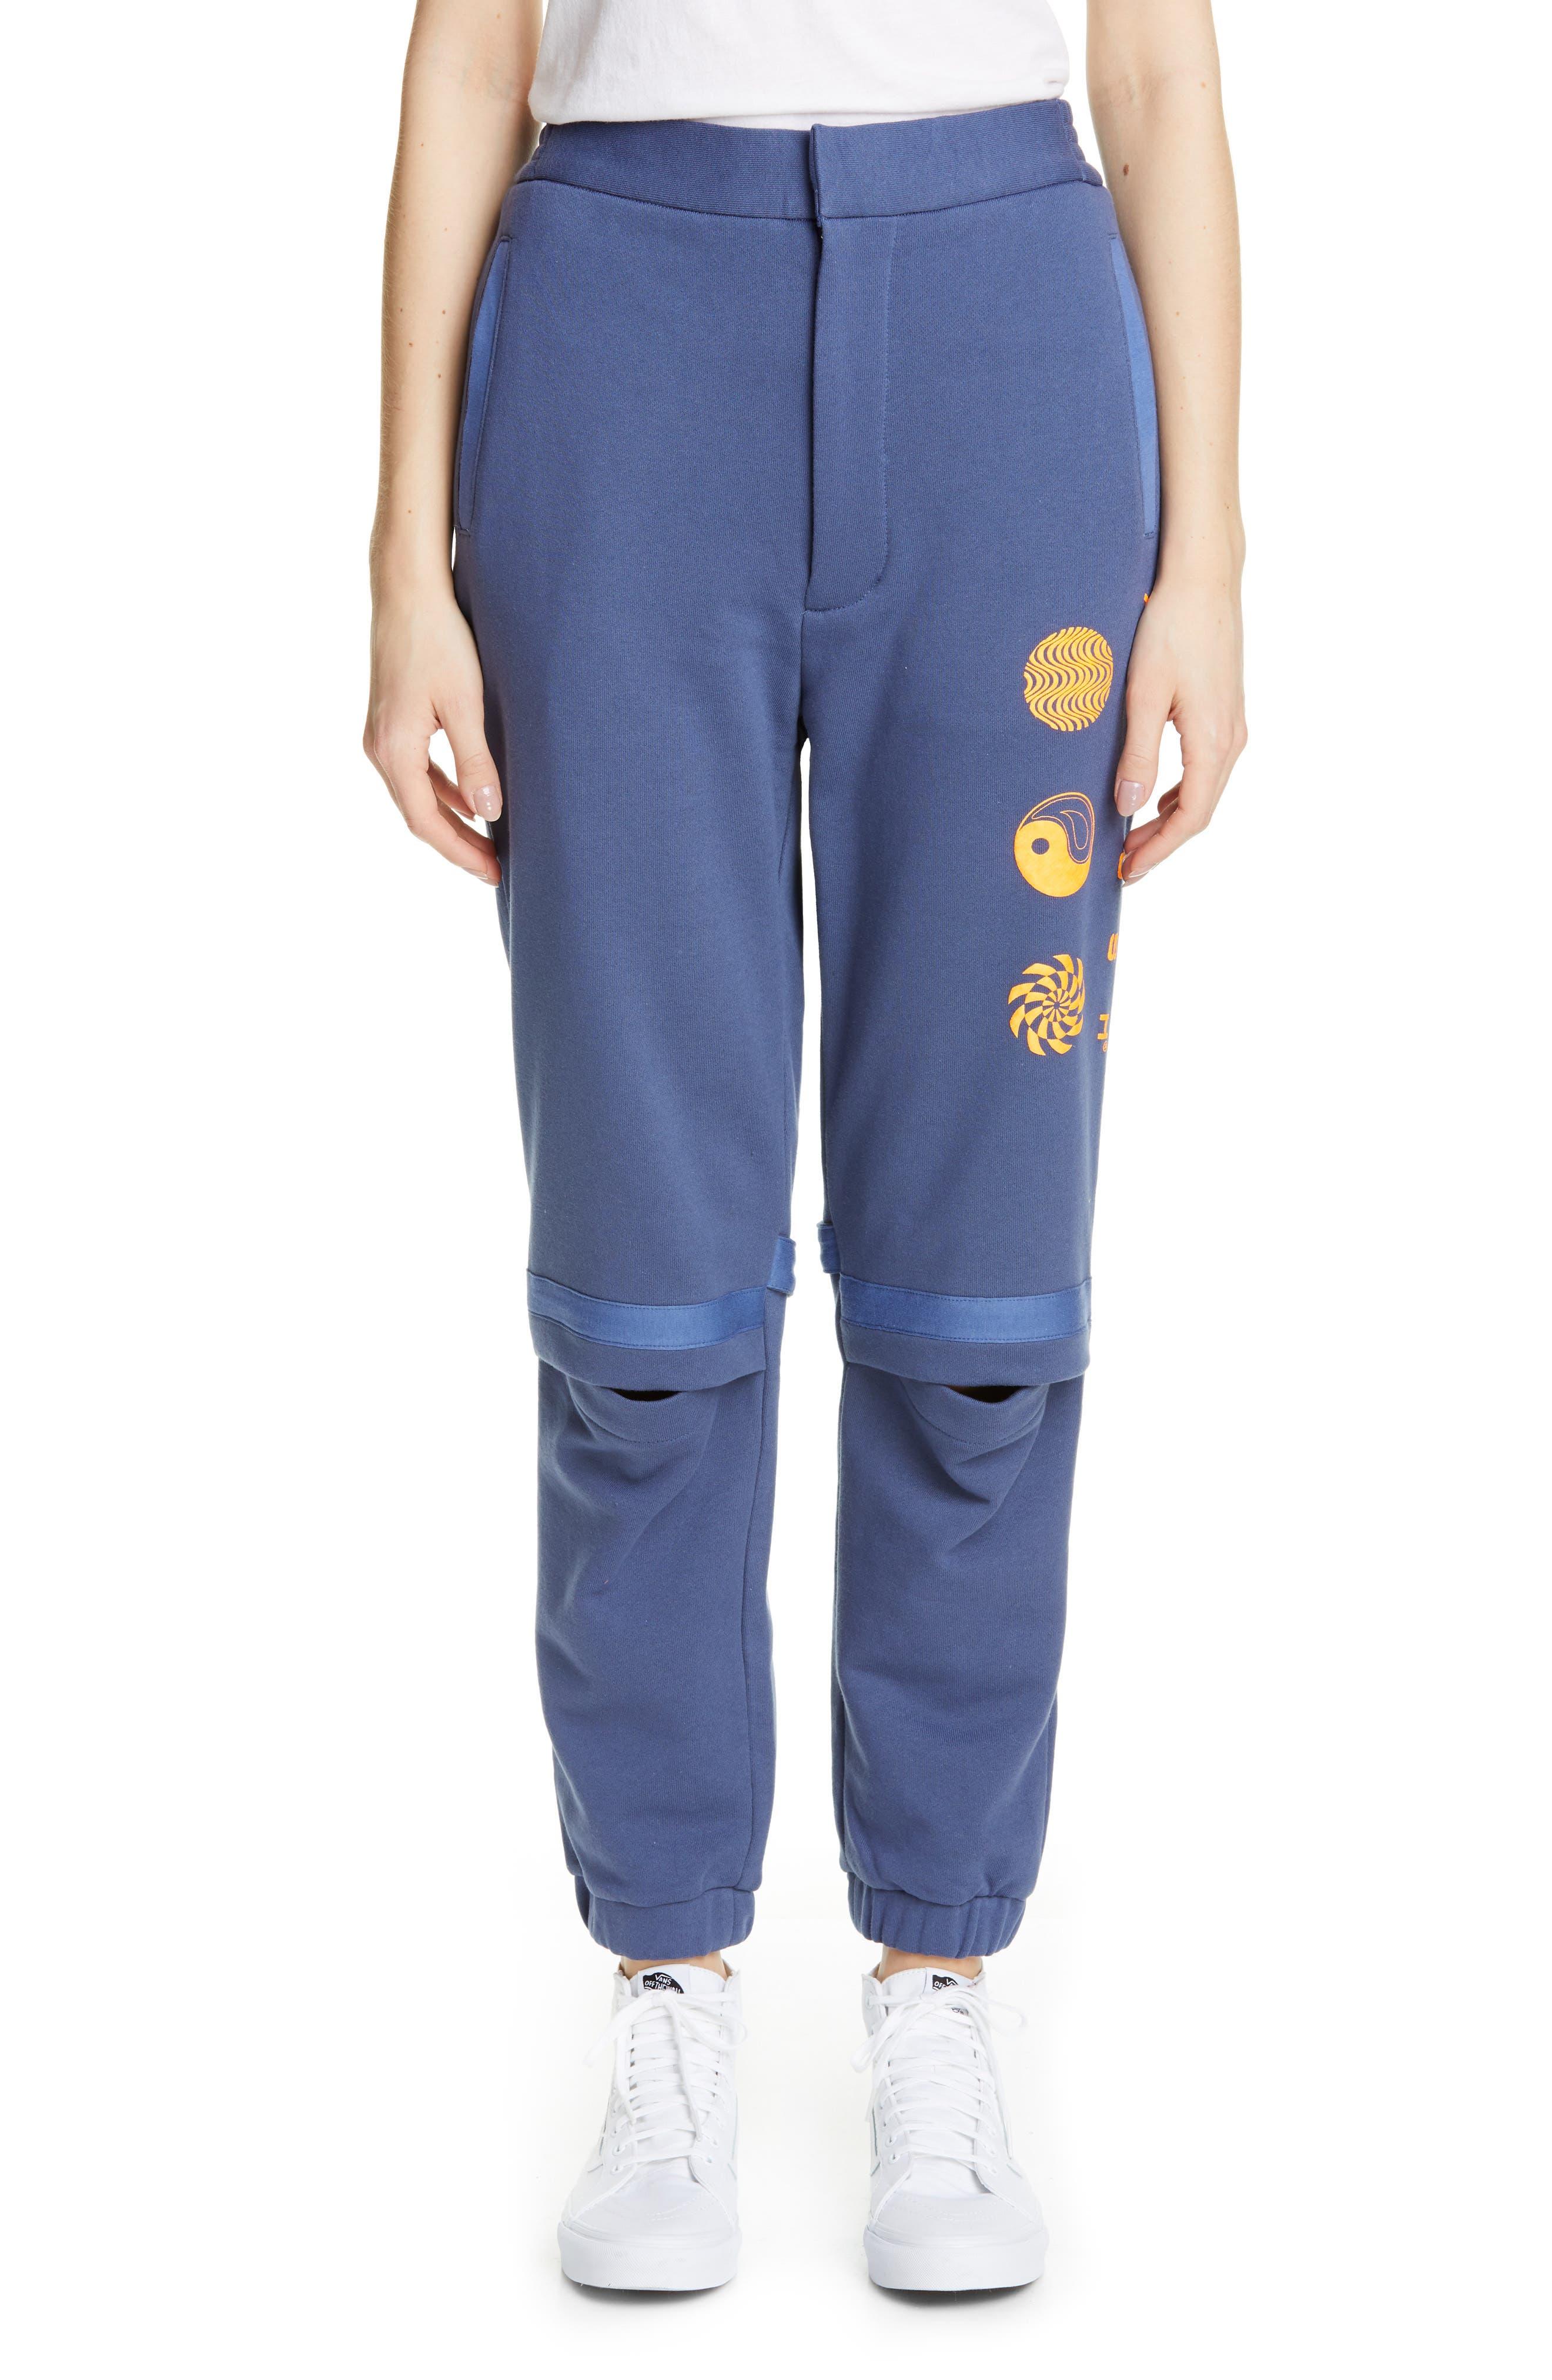 AMBUSH, Slit Knee Sweatpants, Main thumbnail 1, color, BLUE